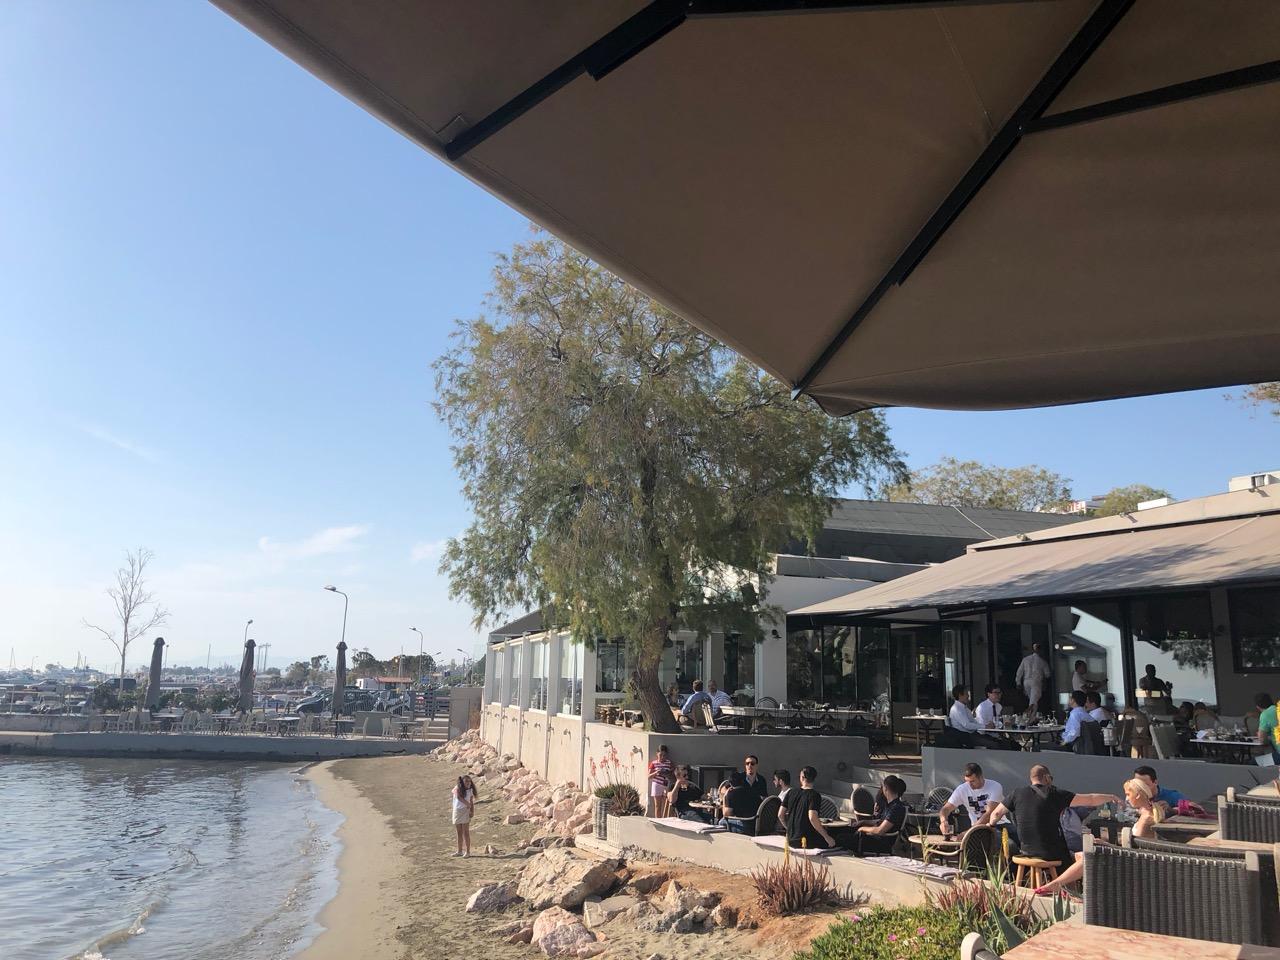 Ark bar, restaurant and coffee shop